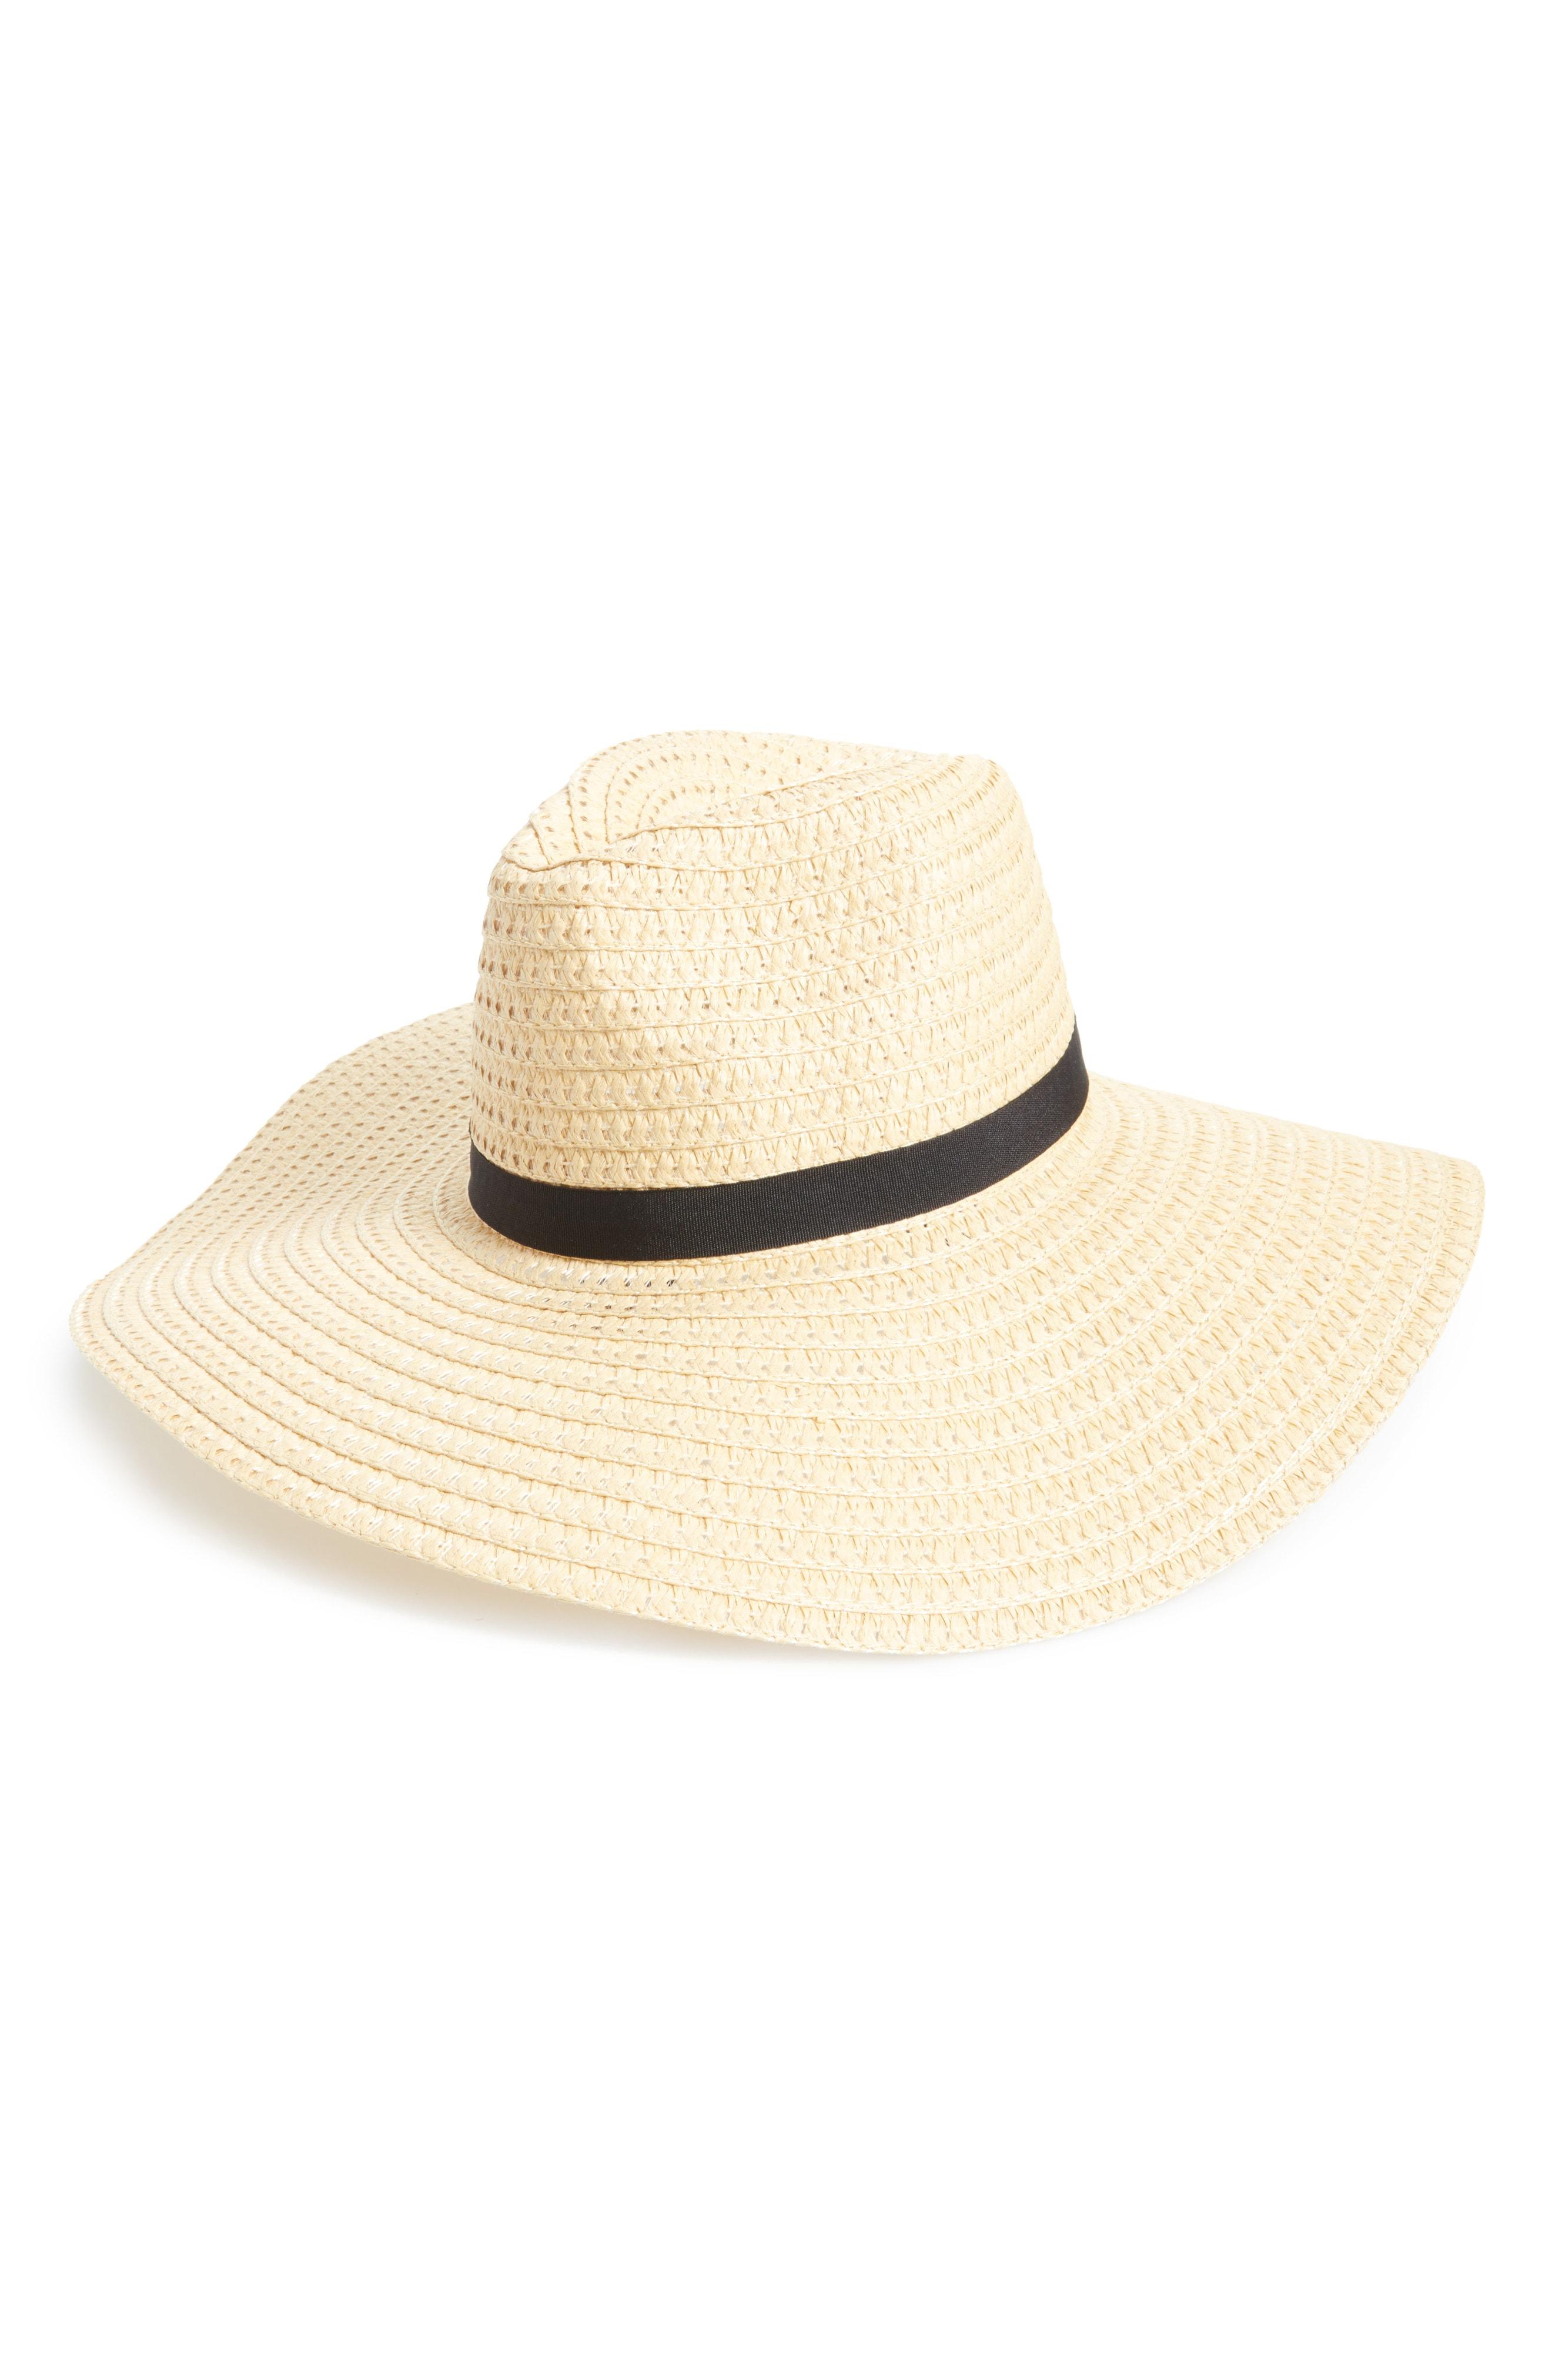 Women's Floppy Hats | Nordstrom